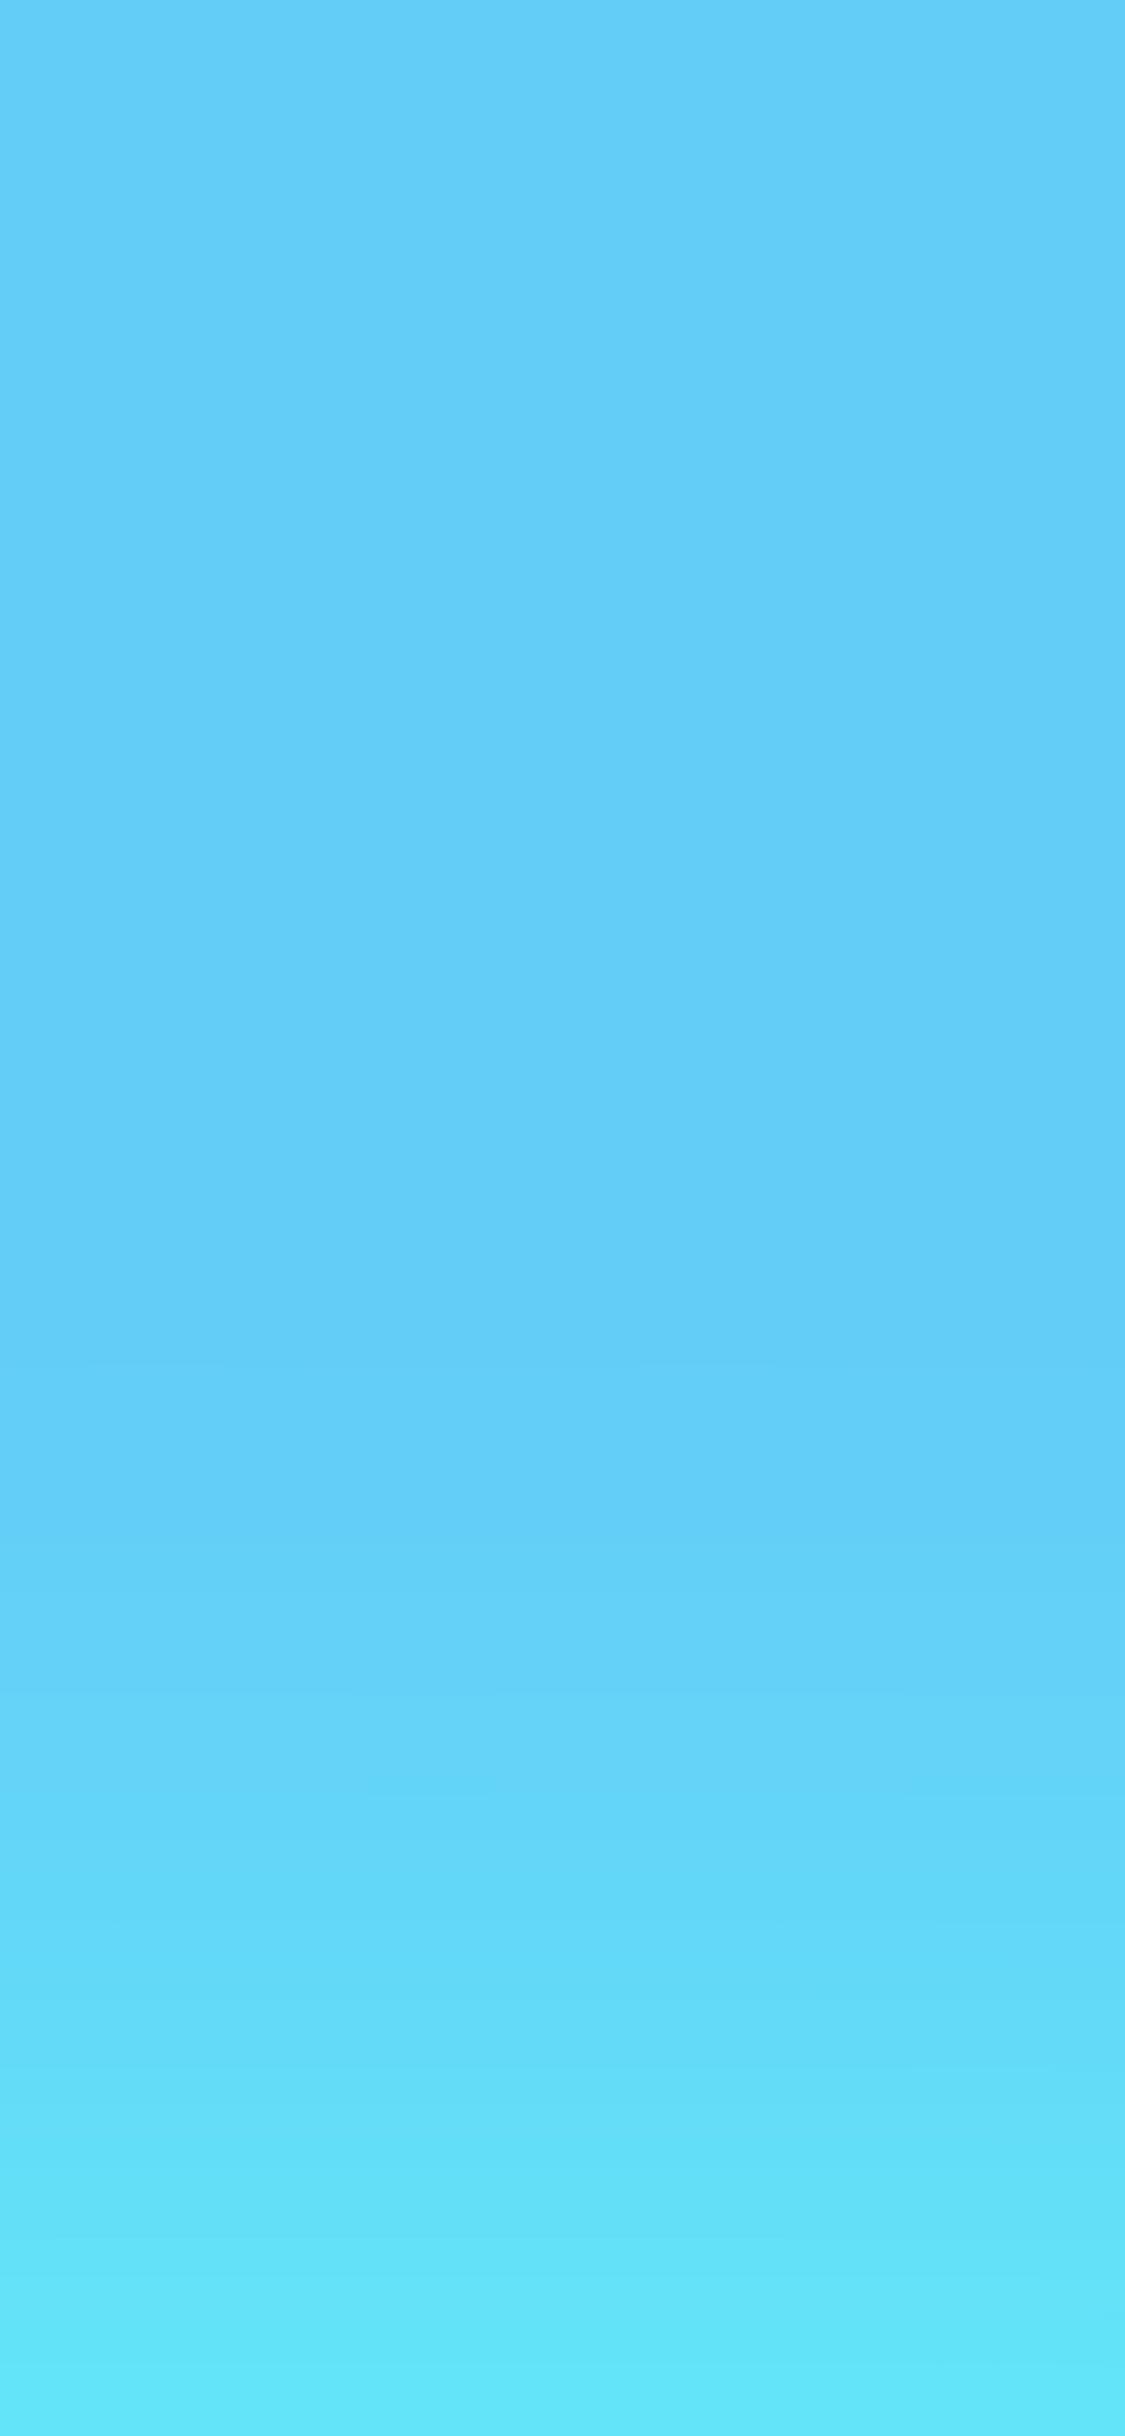 iPhoneXpapers.com-Apple-iPhone-wallpaper-sc10-clear-sky-dream-light-blur